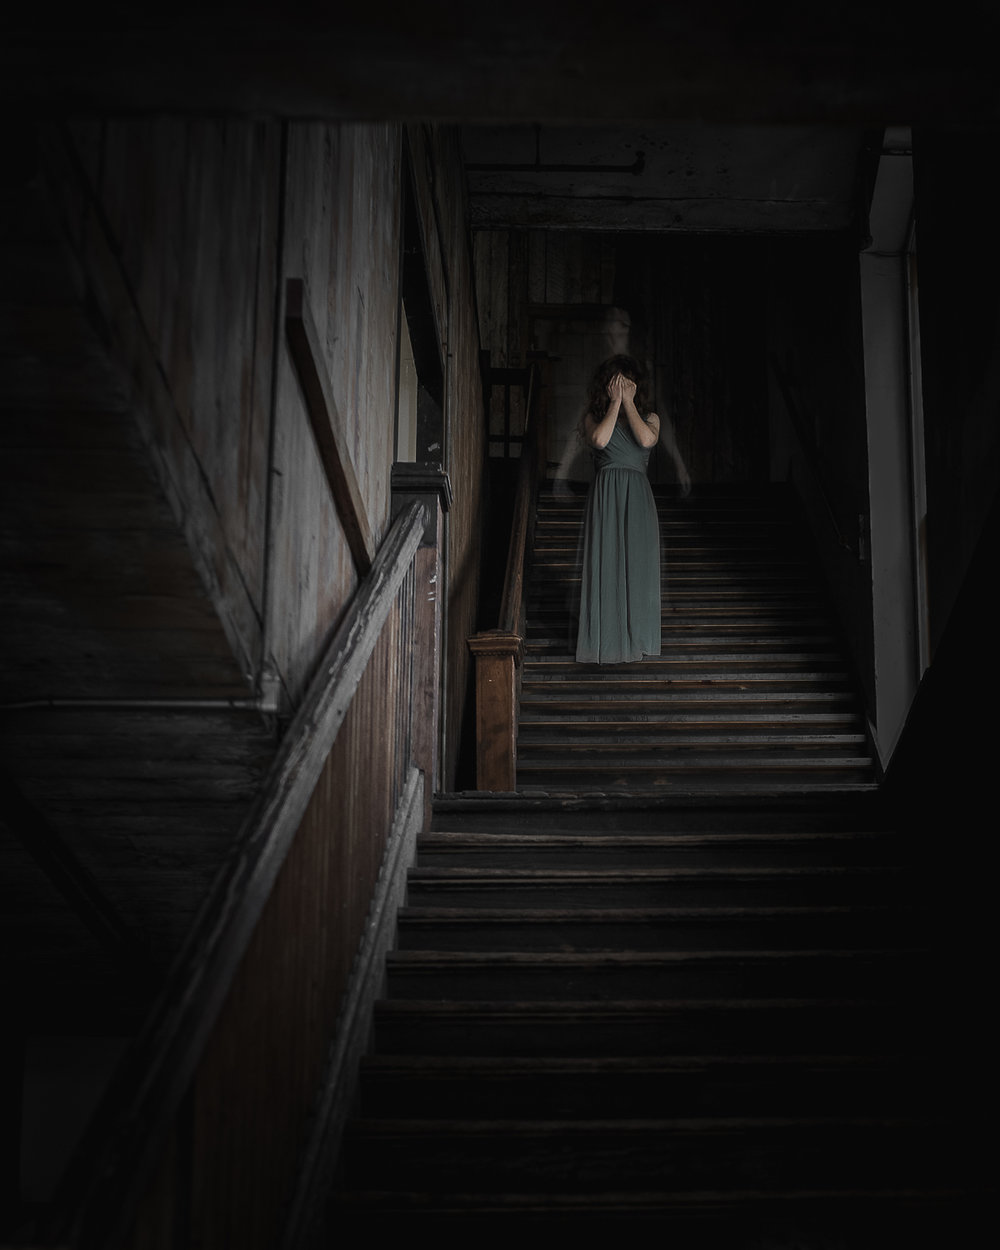 sarahbsmithart-dreams-ghosts--10.jpg